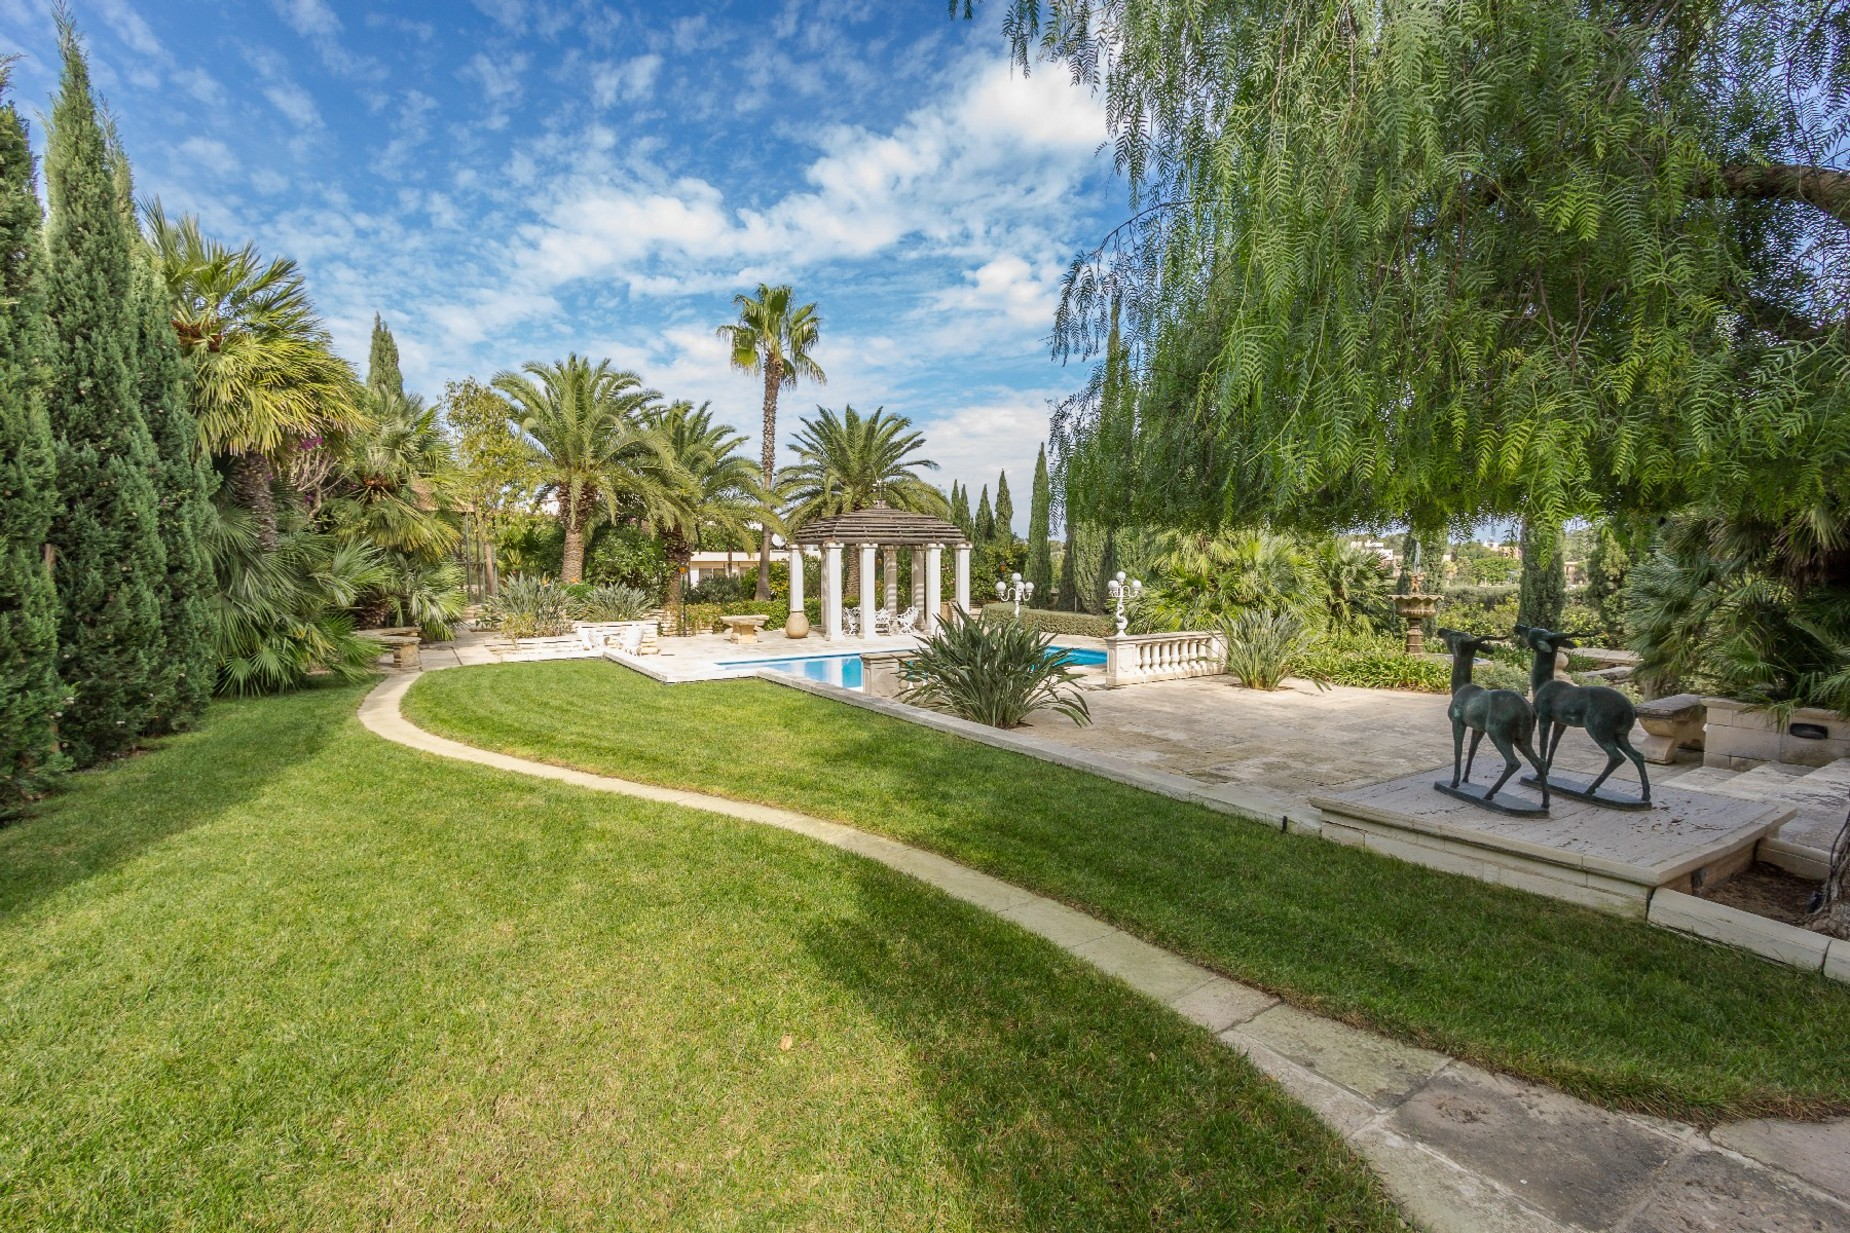 5 bed Villa For Rent in Iklin, Iklin - thumb 3